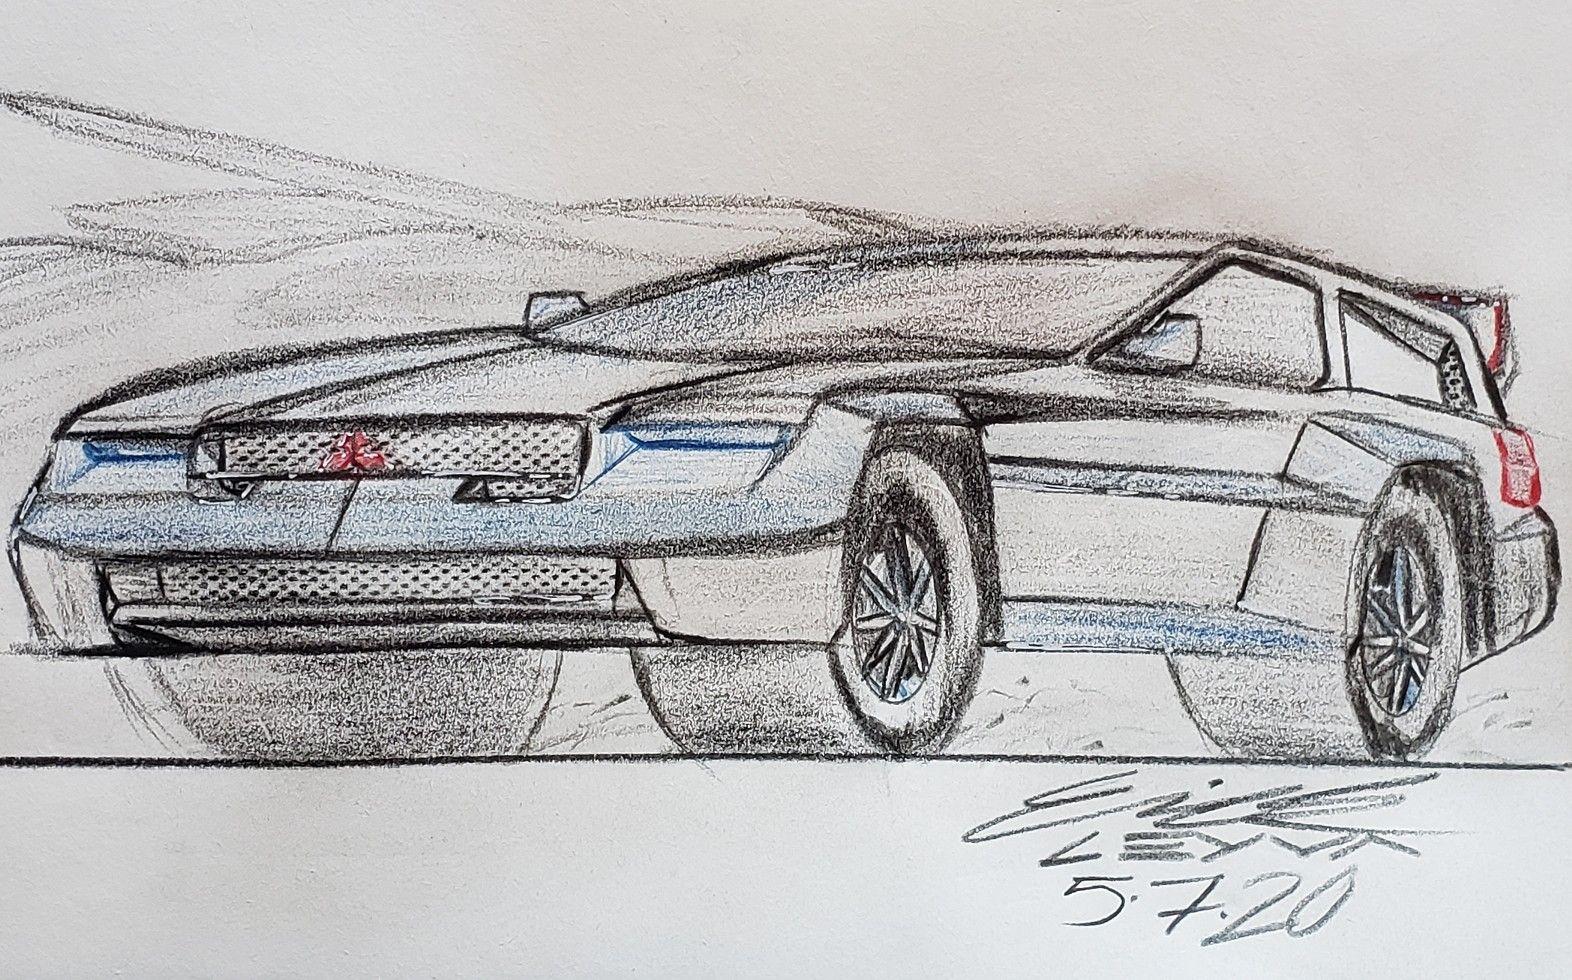 Mitsubishi Pajero Evolution Concept In 2020 Automotive Design Expedition Vehicle Concept Cars